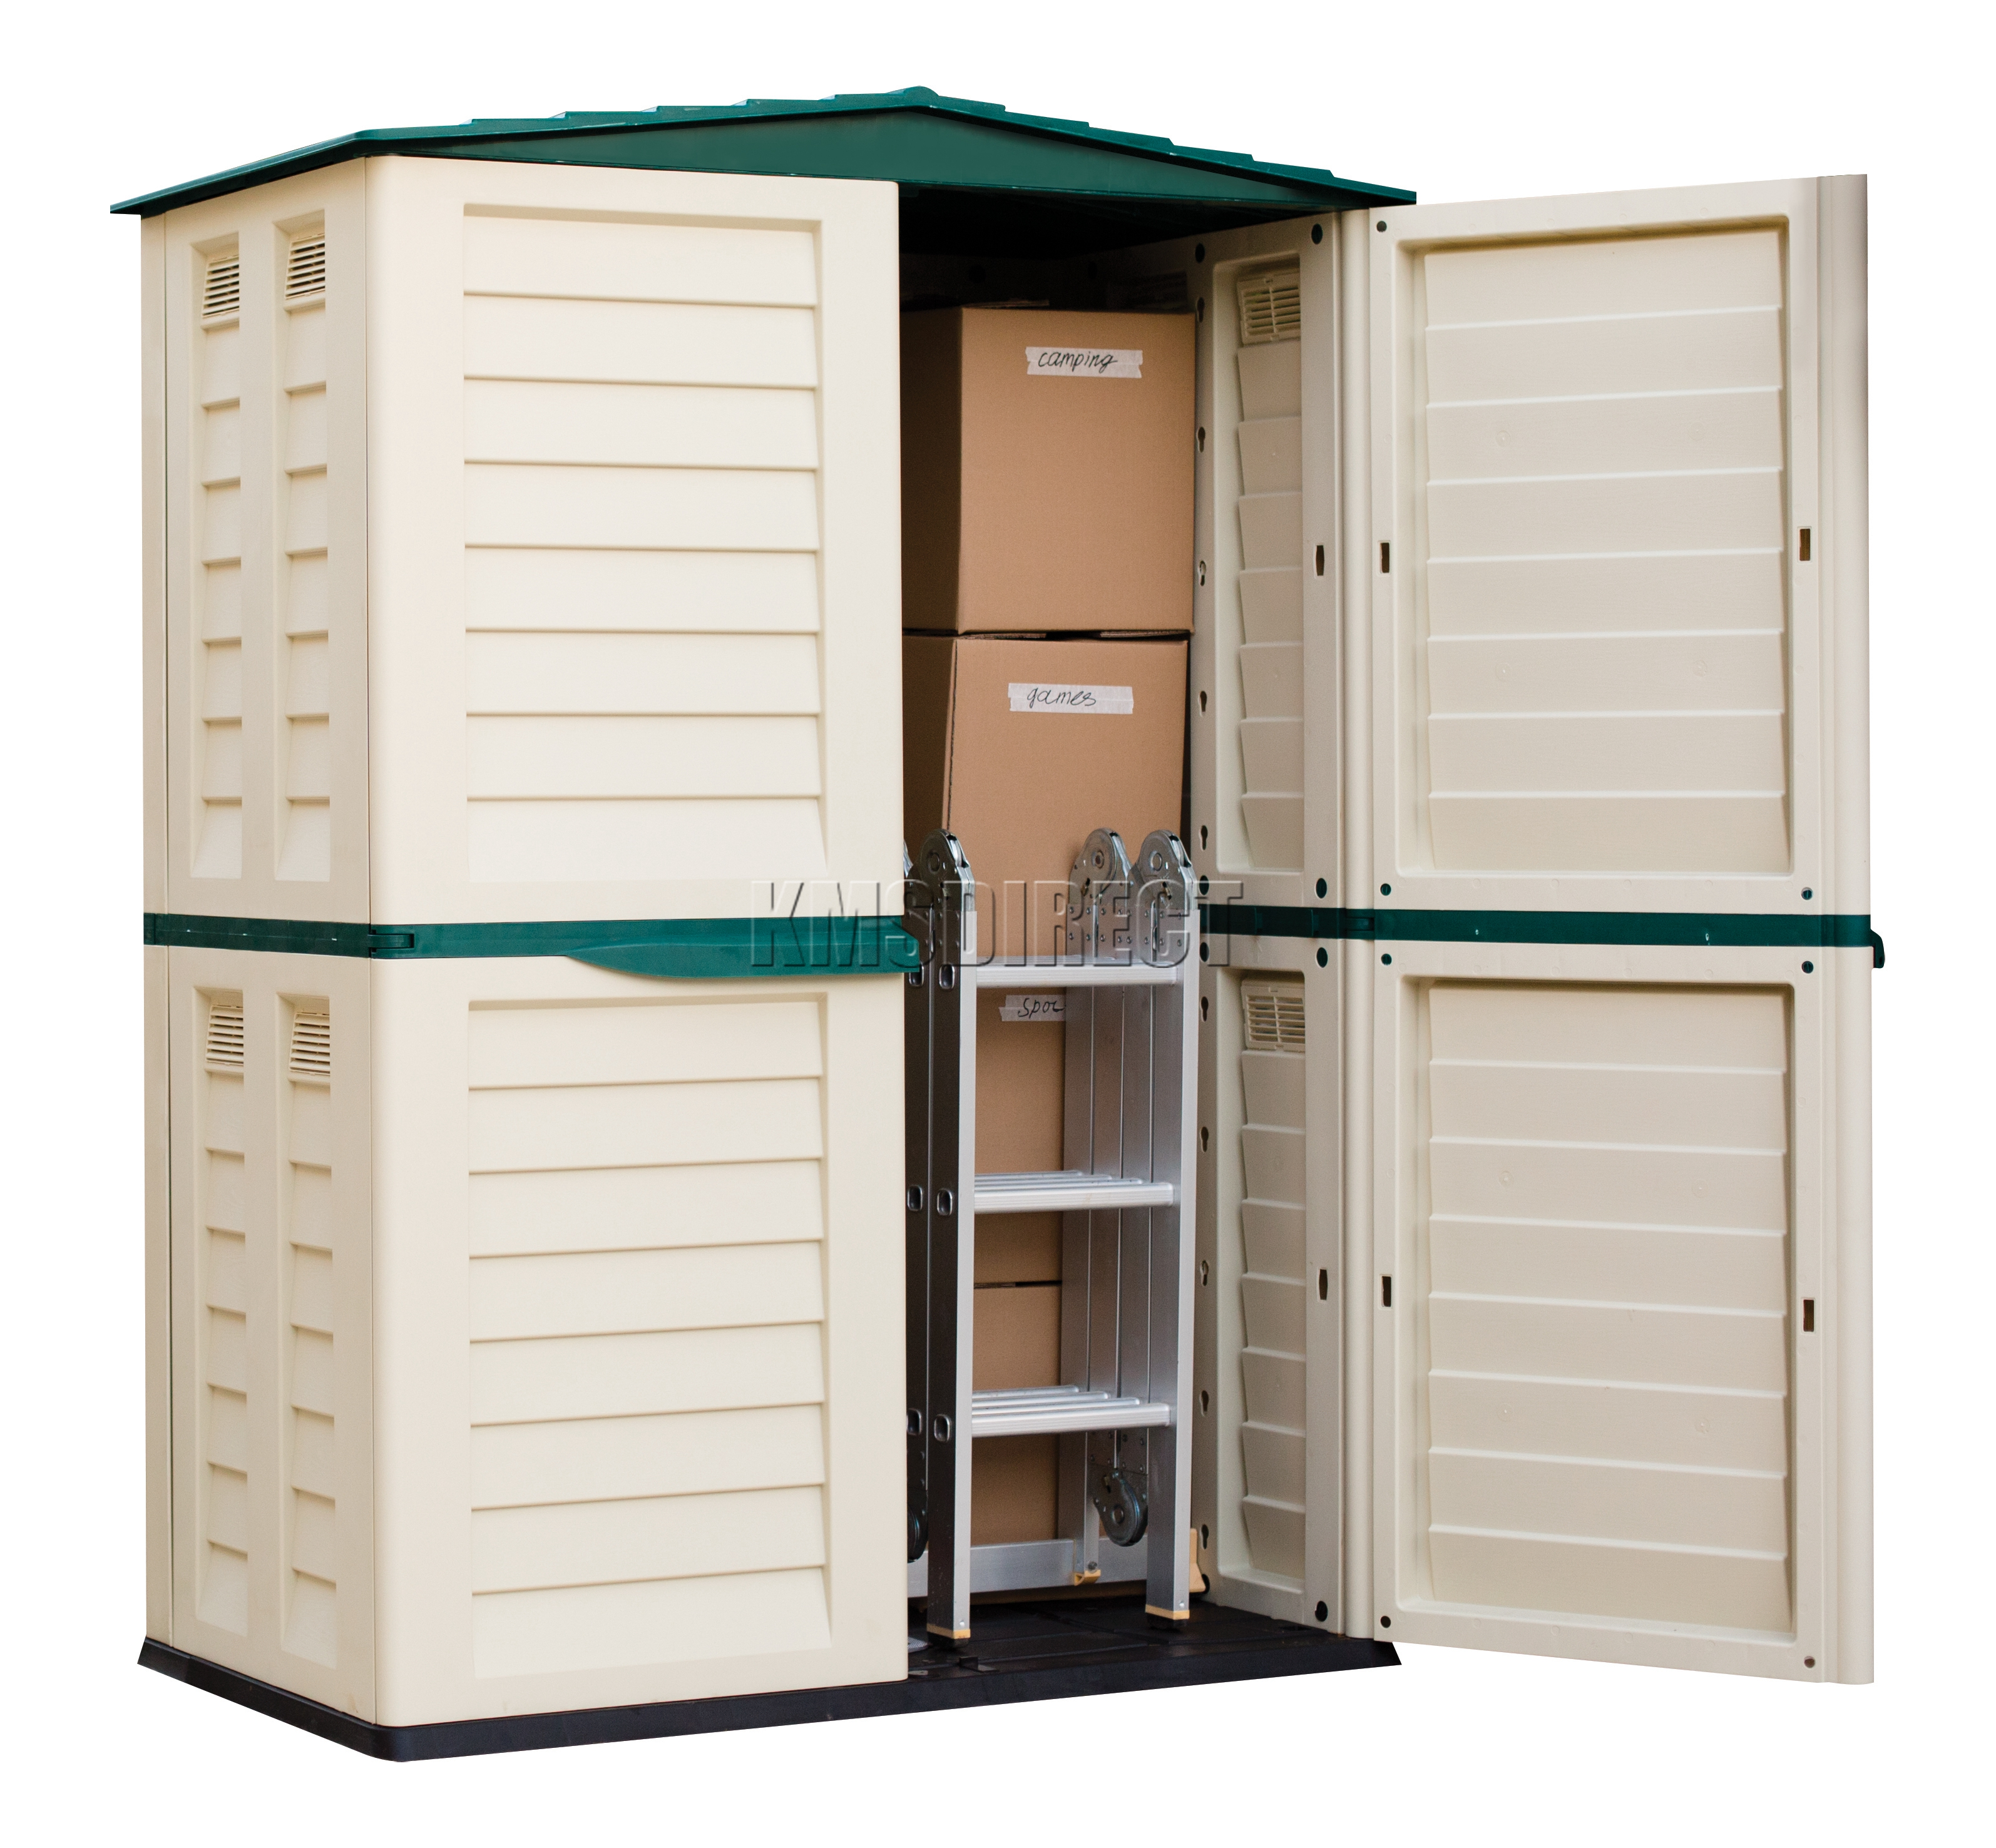 var home outdoor shed safe unit x box starplast plastic tall garden storage